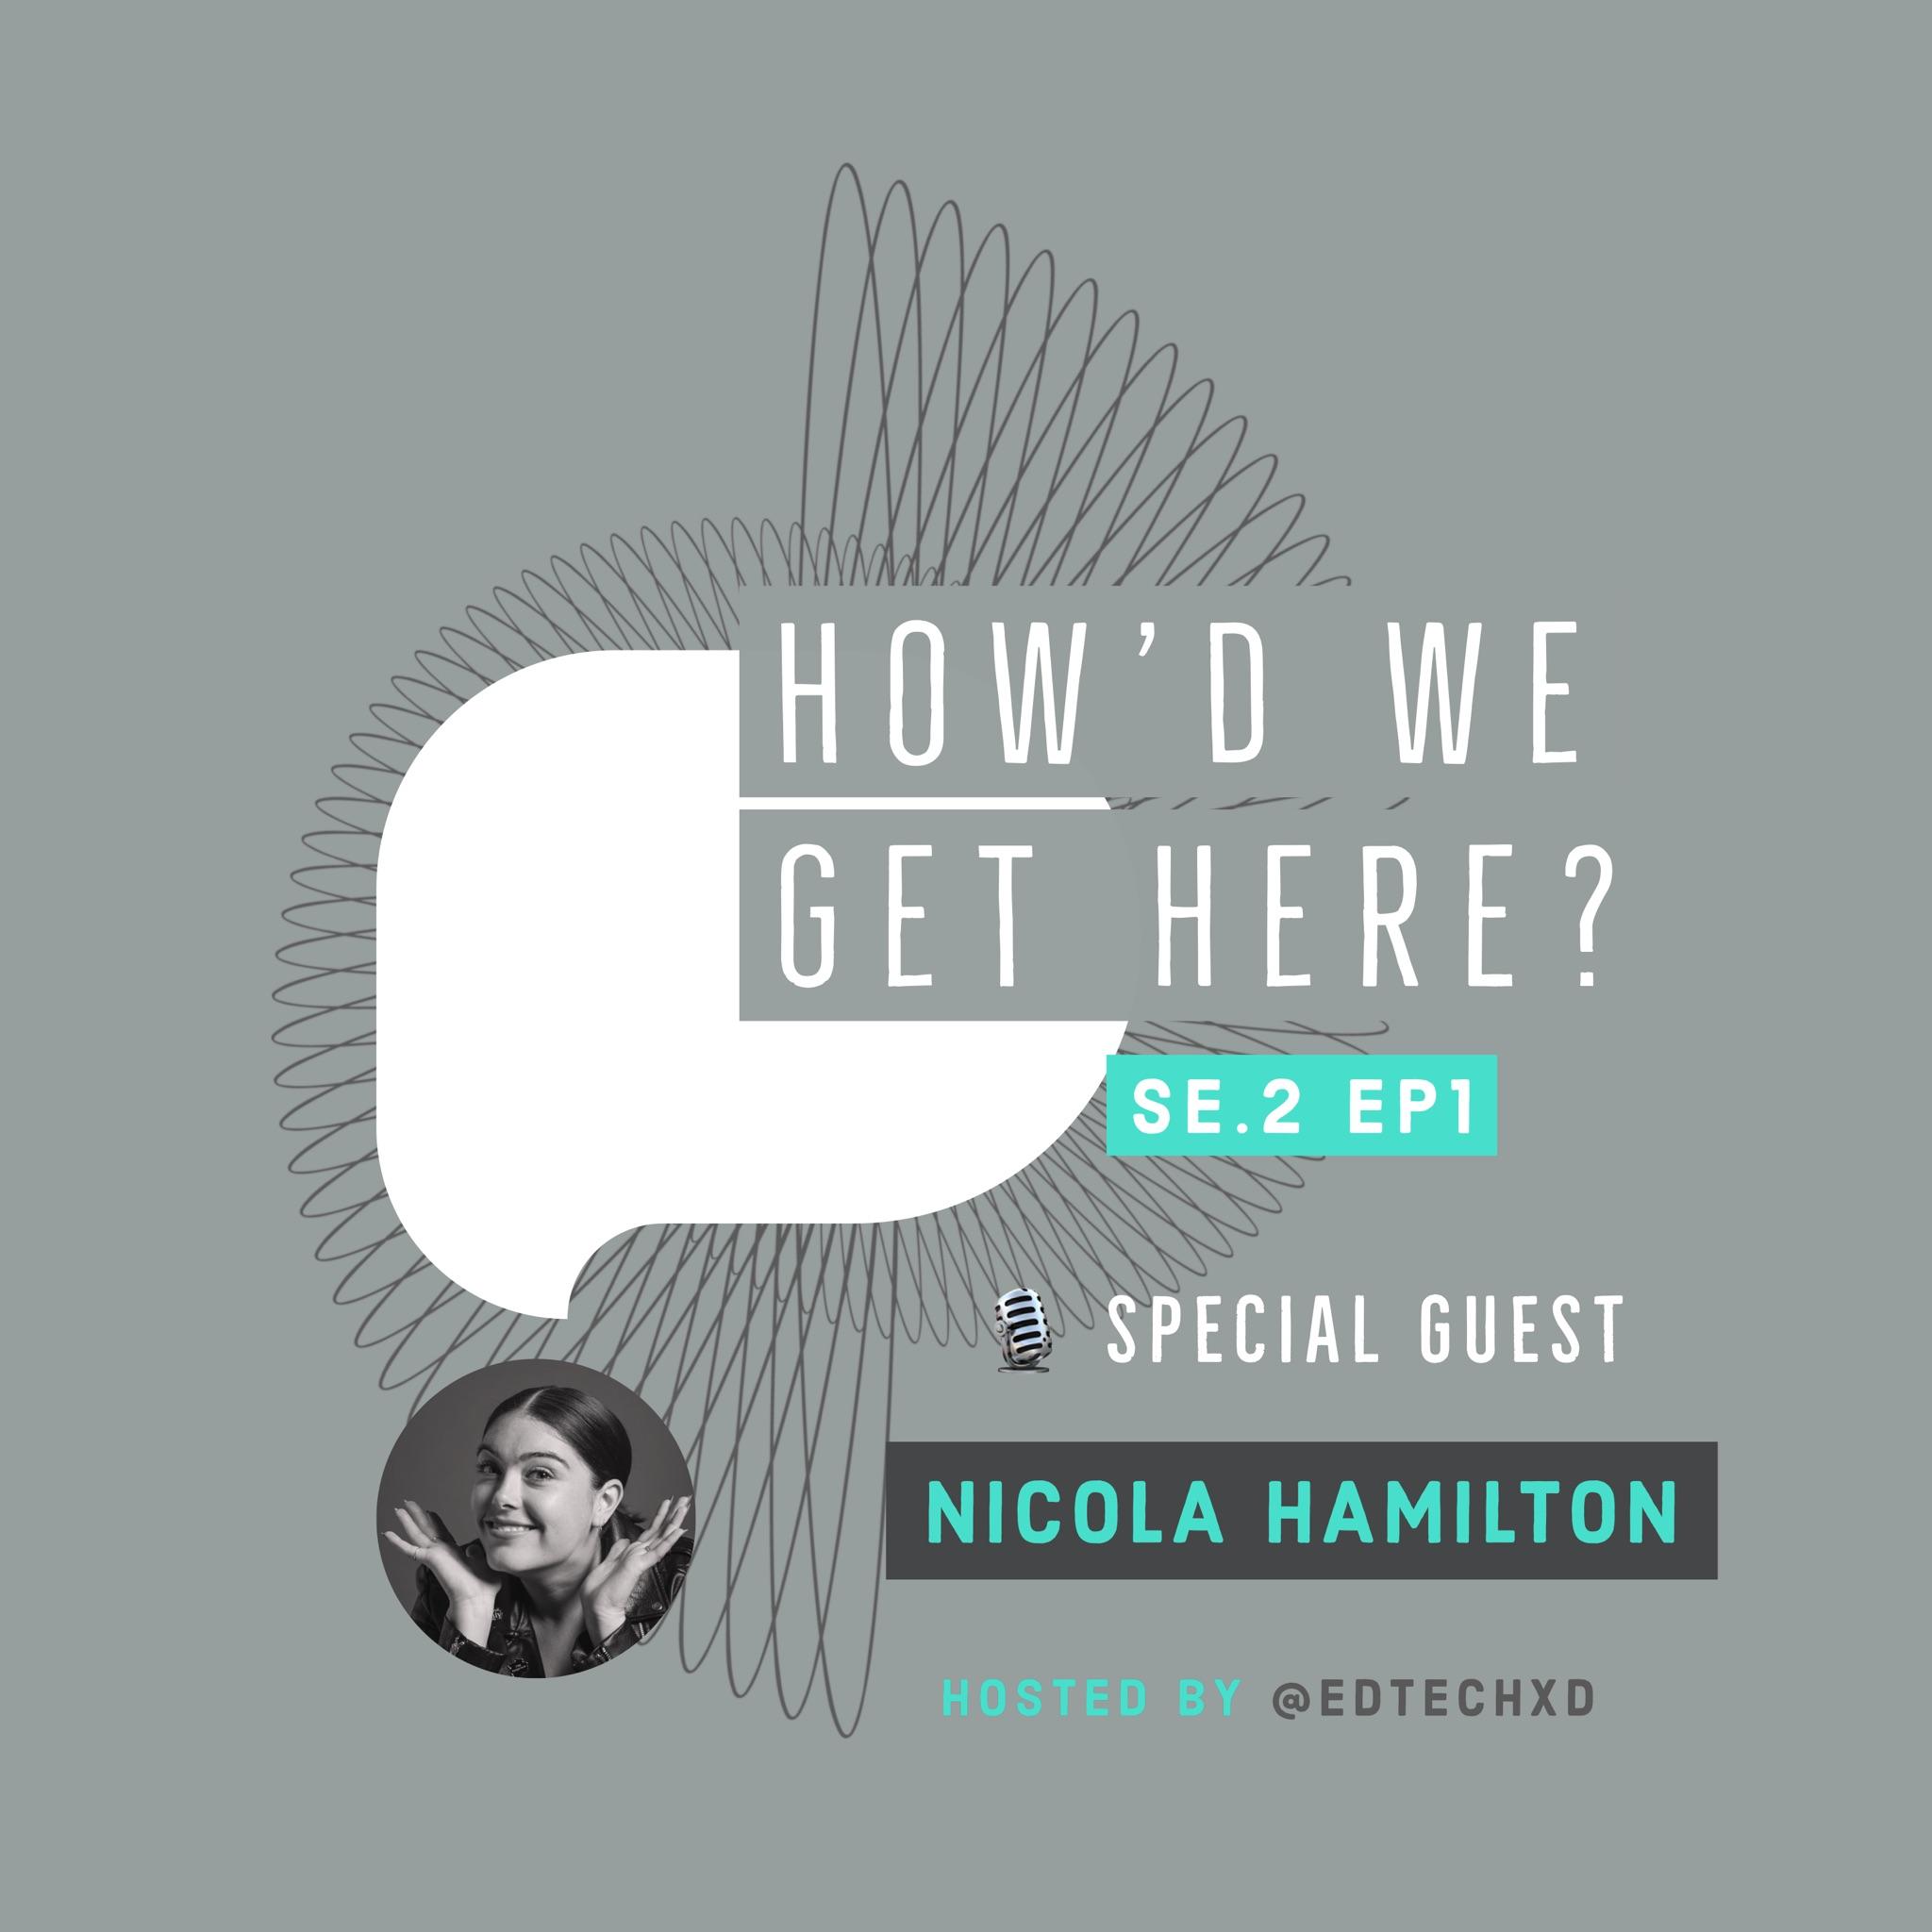 How'd we get here? podcast season 2 episode 1. Nicola Hamilton. Professional Personas.